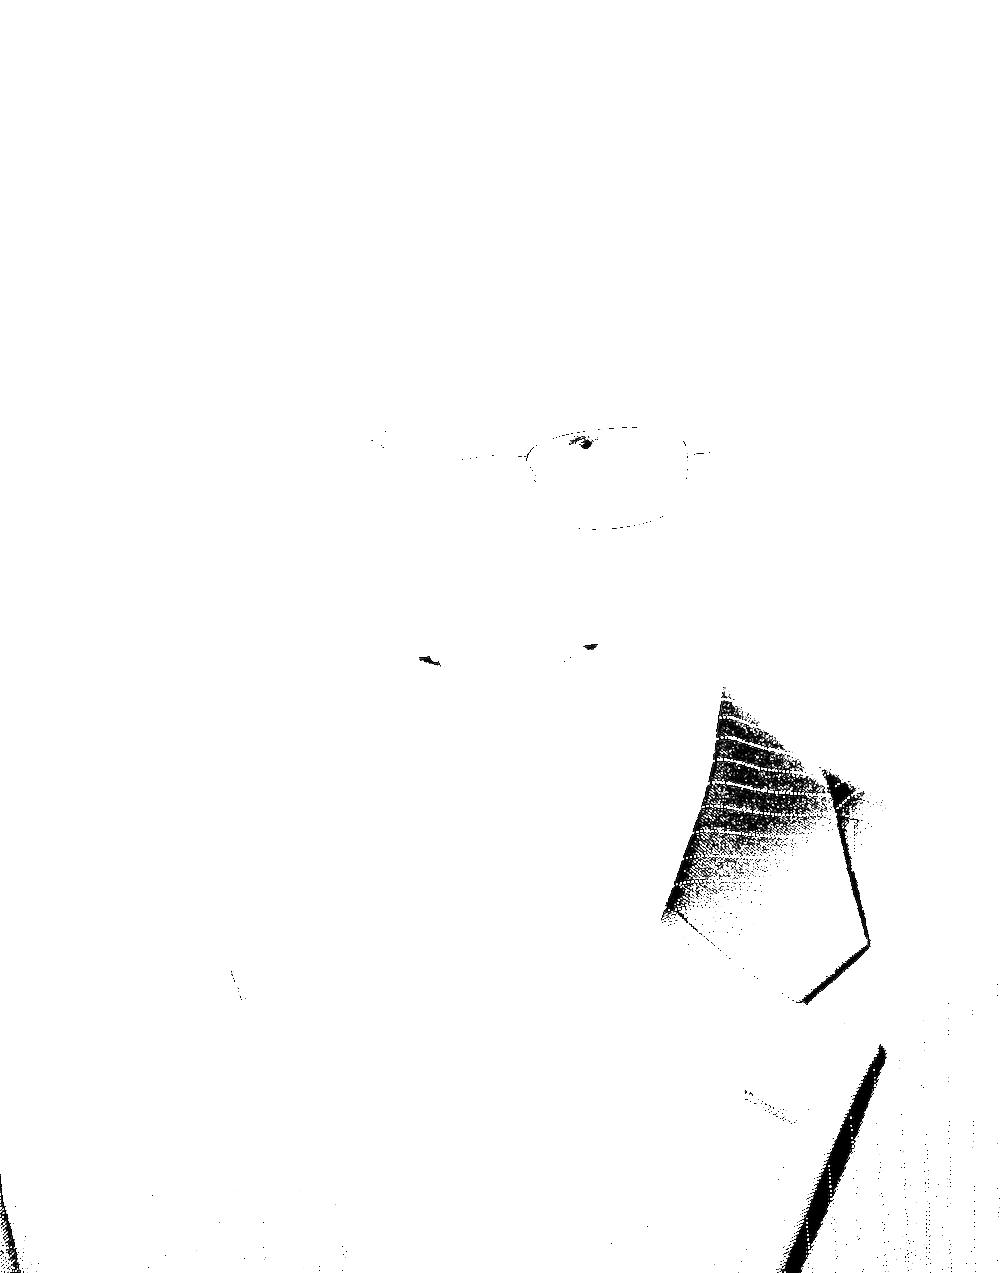 bmc-8272.png